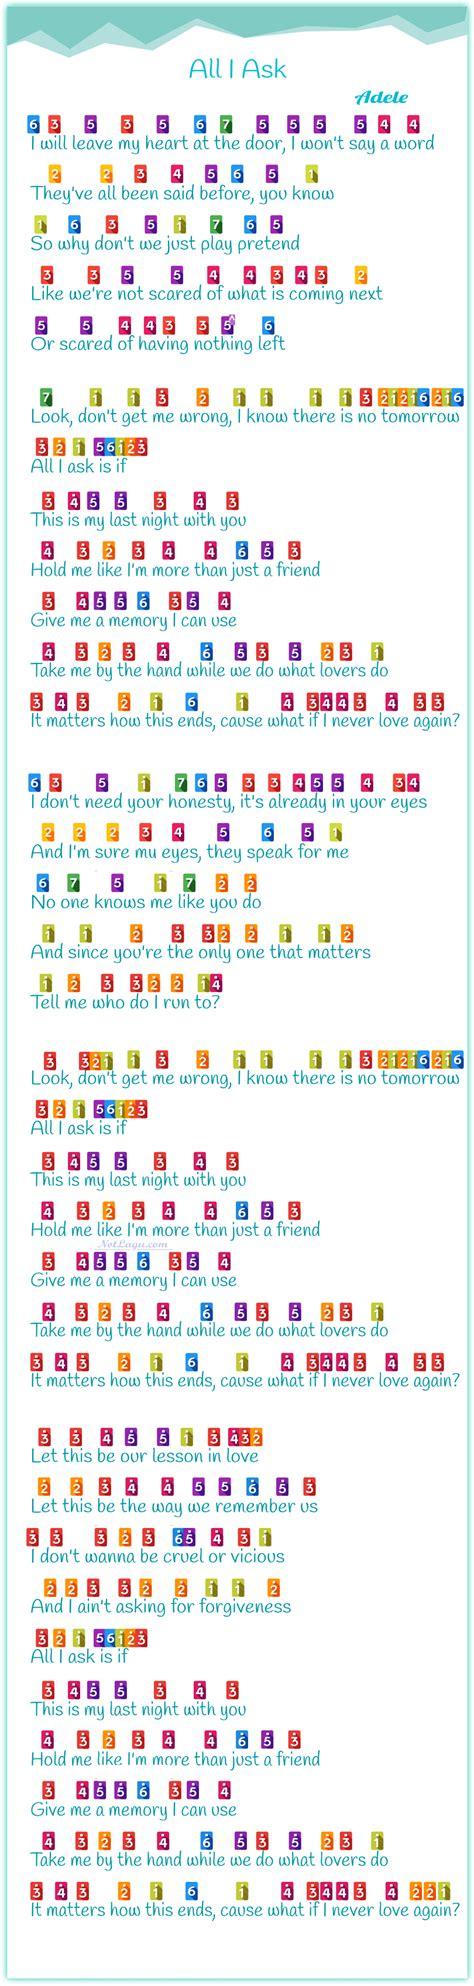 not angka lagu justin bieber not angka lagu all i ask pianika adele lengkap dan mudah